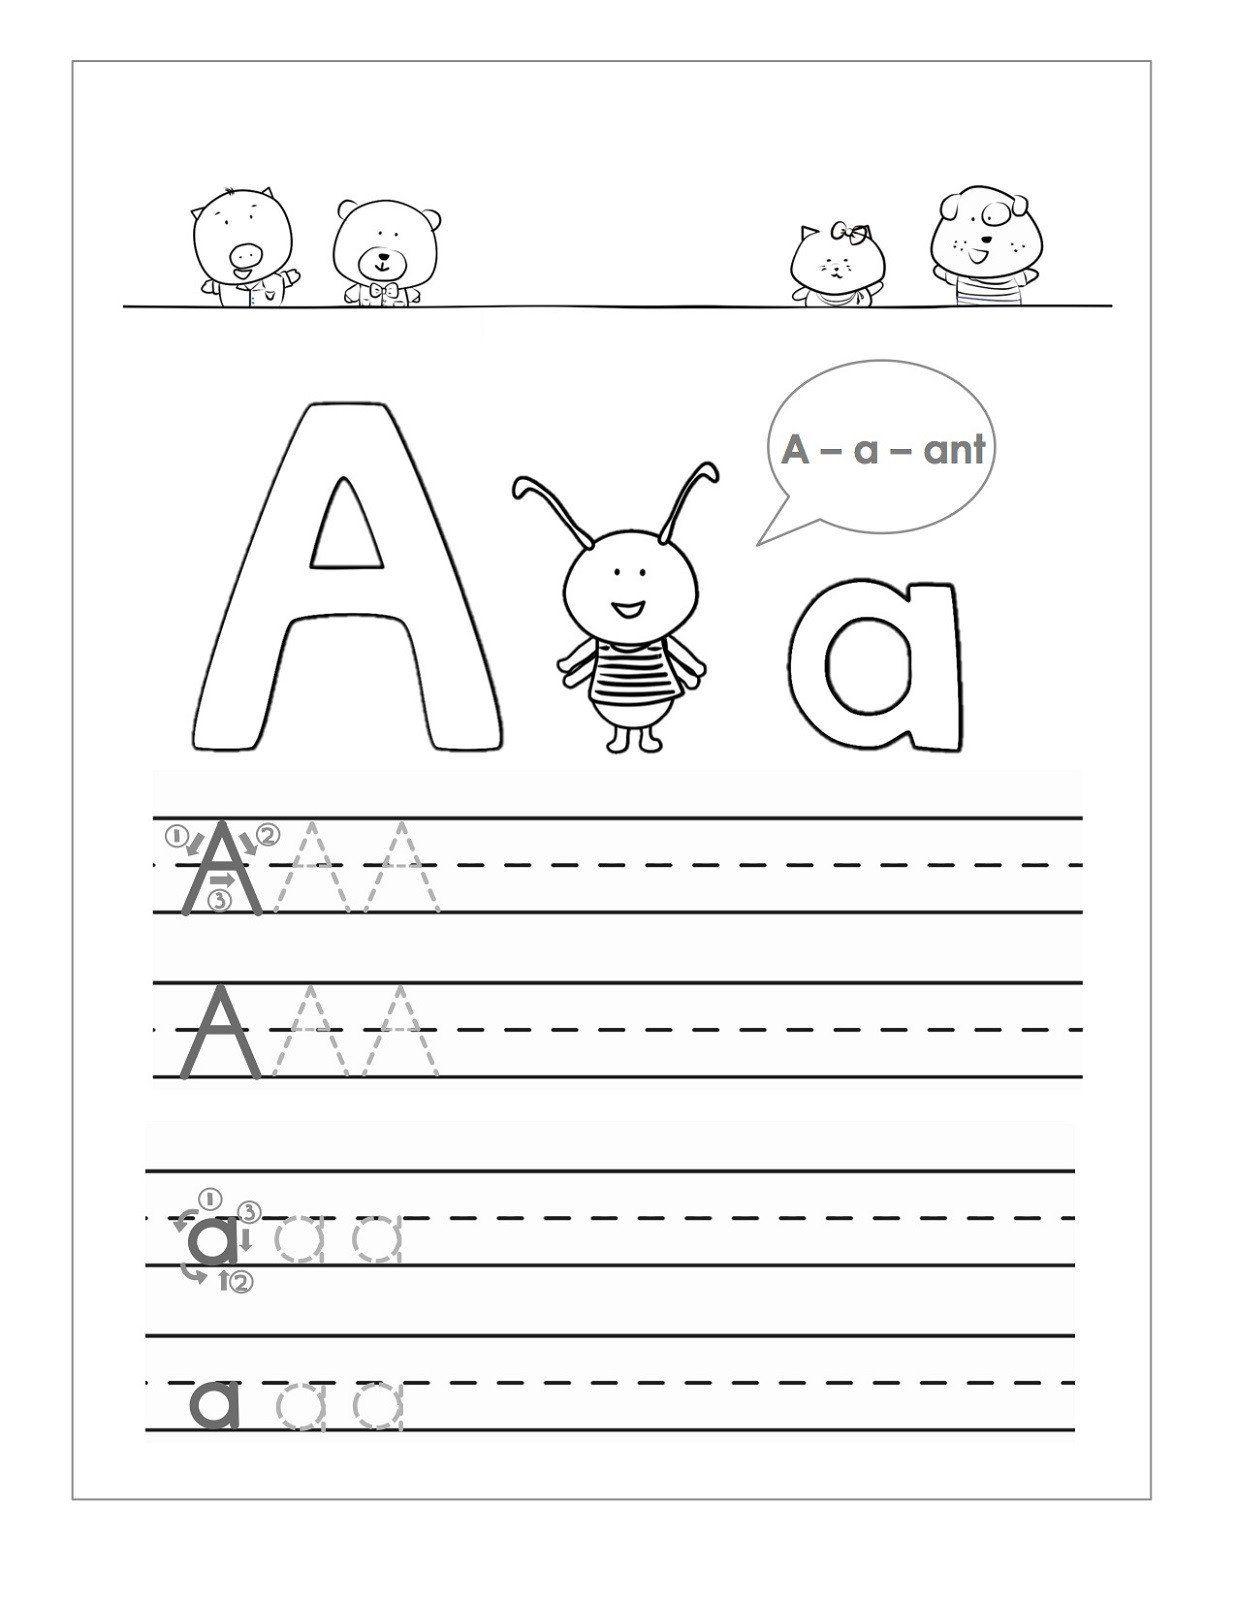 Free Handwriting Worksheet For Kindergarten Free Handwriting Worksheets For Kids In 2020 Handwriting Worksheets For Kids Alphabet Practice Sheets Abc Worksheets